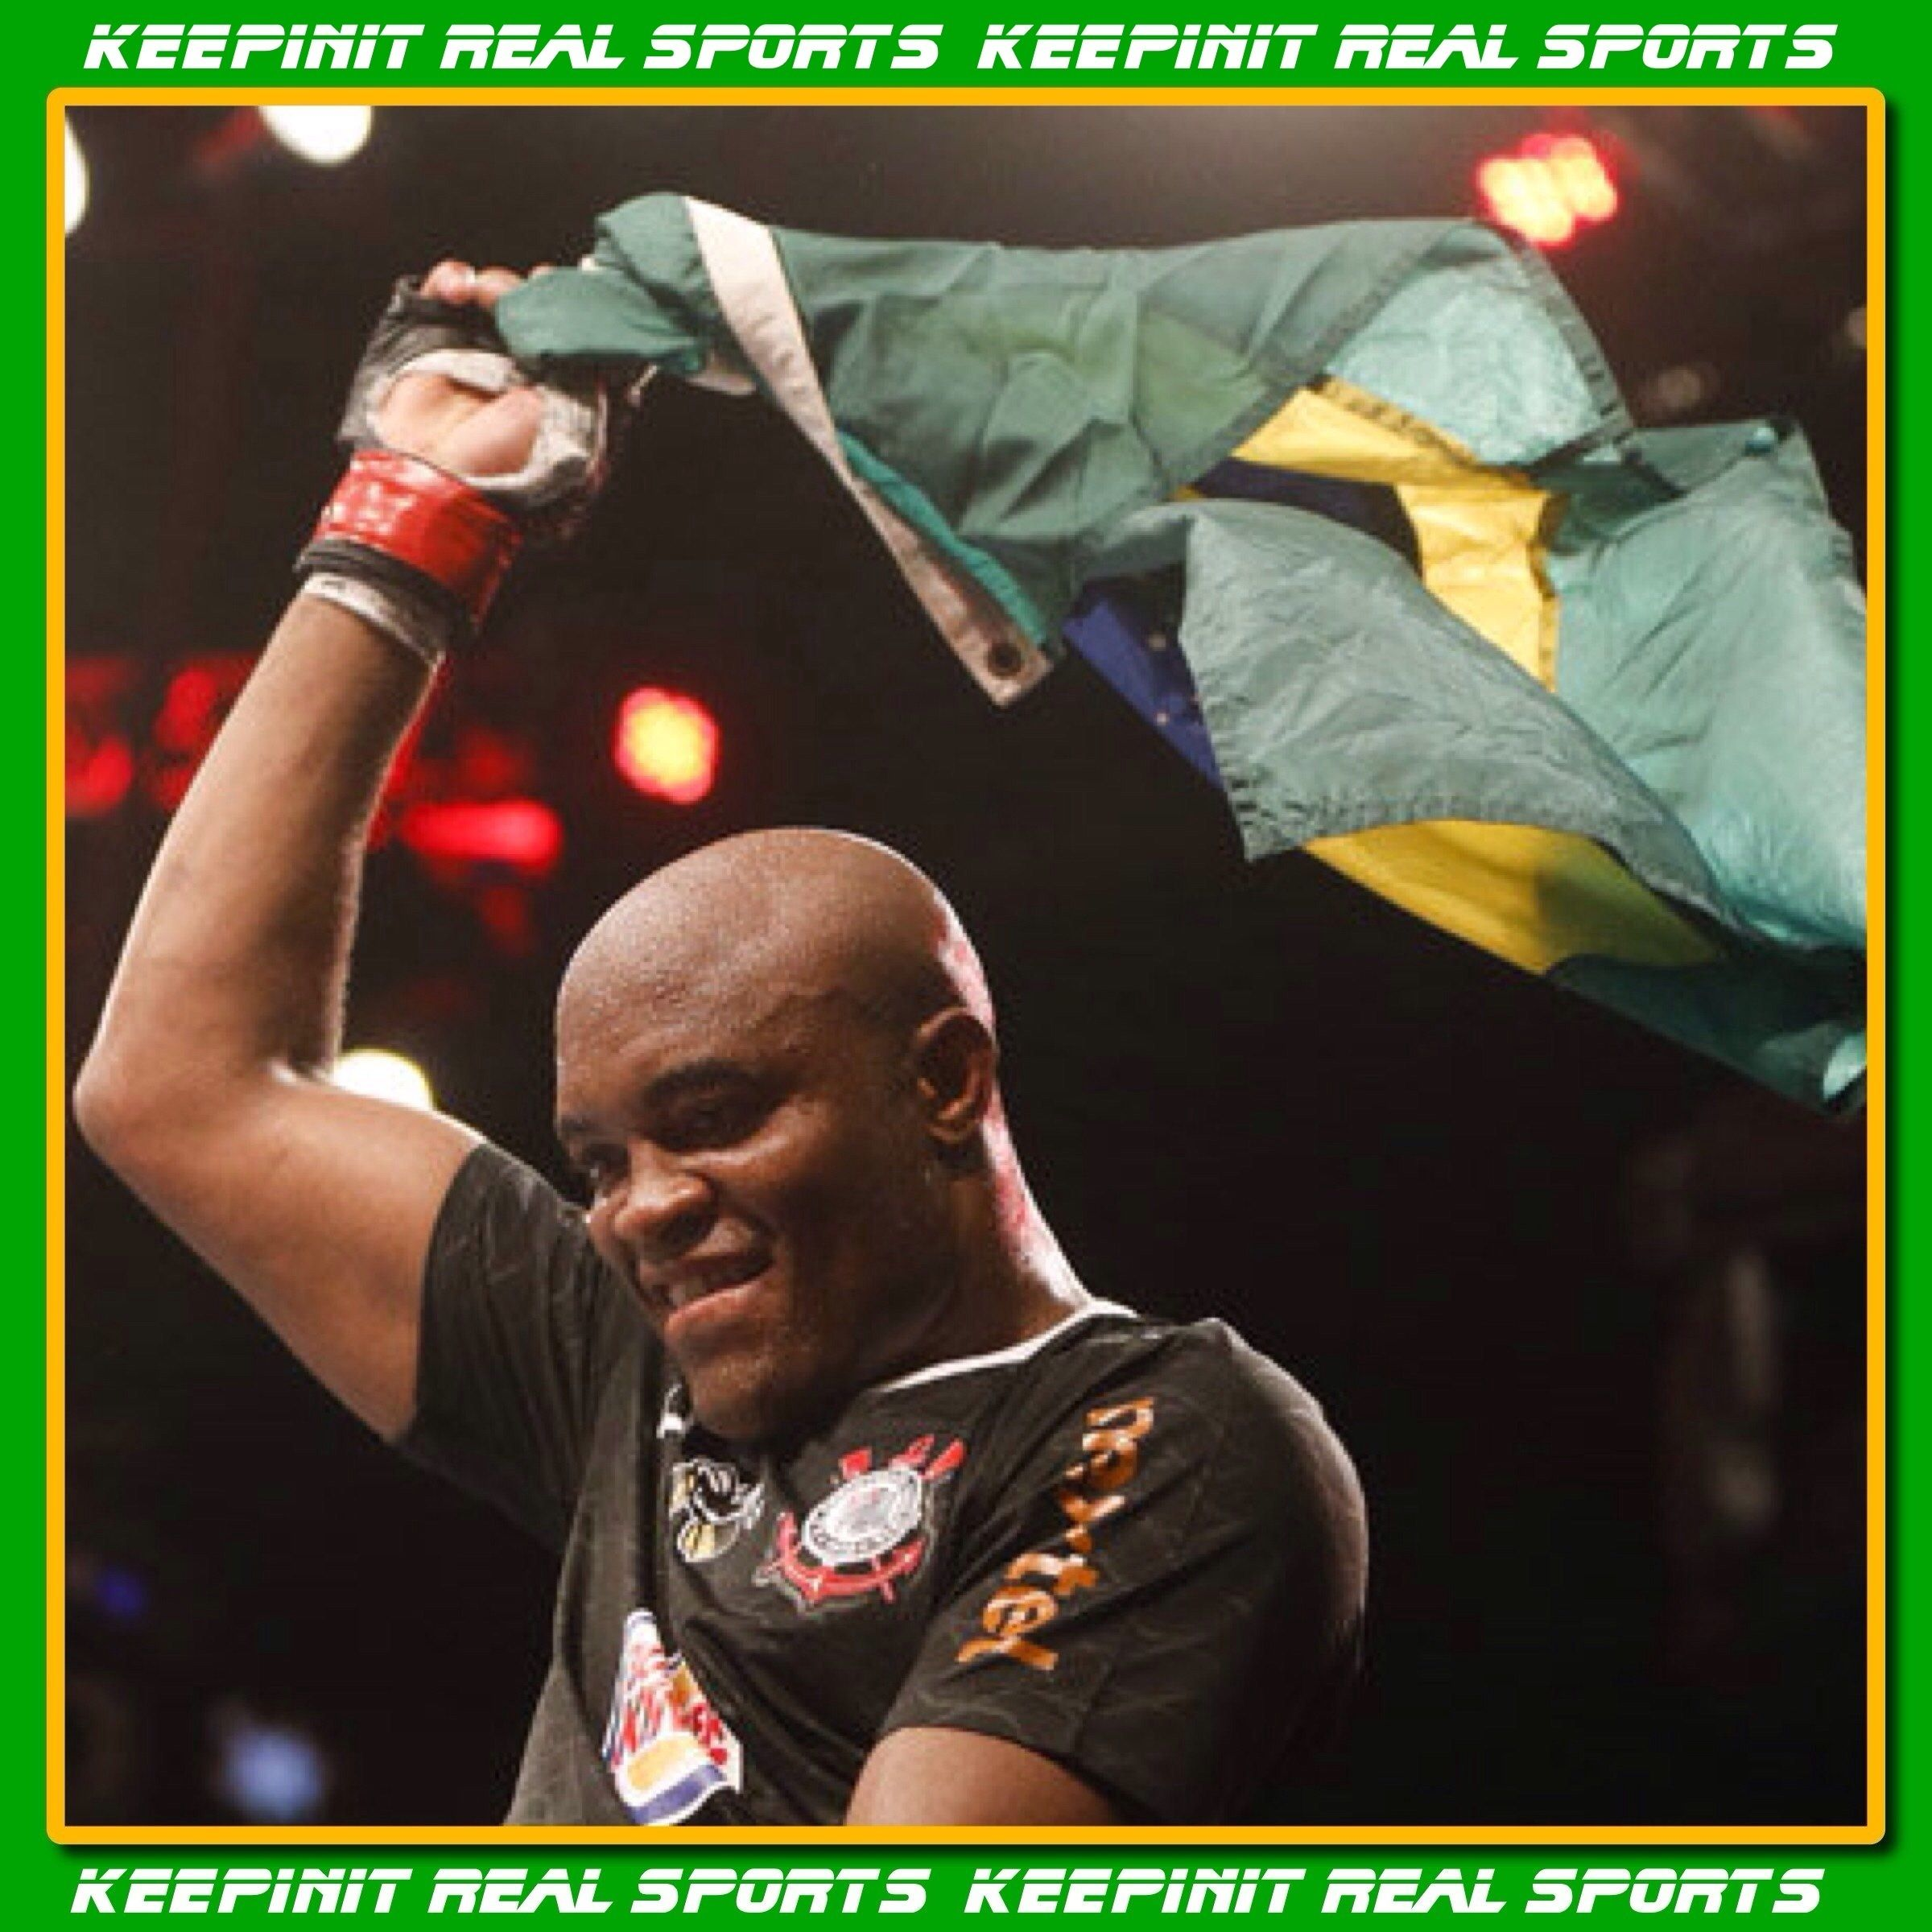 MMA: Silva Defeats Bonnar UFC Middleweight Champion